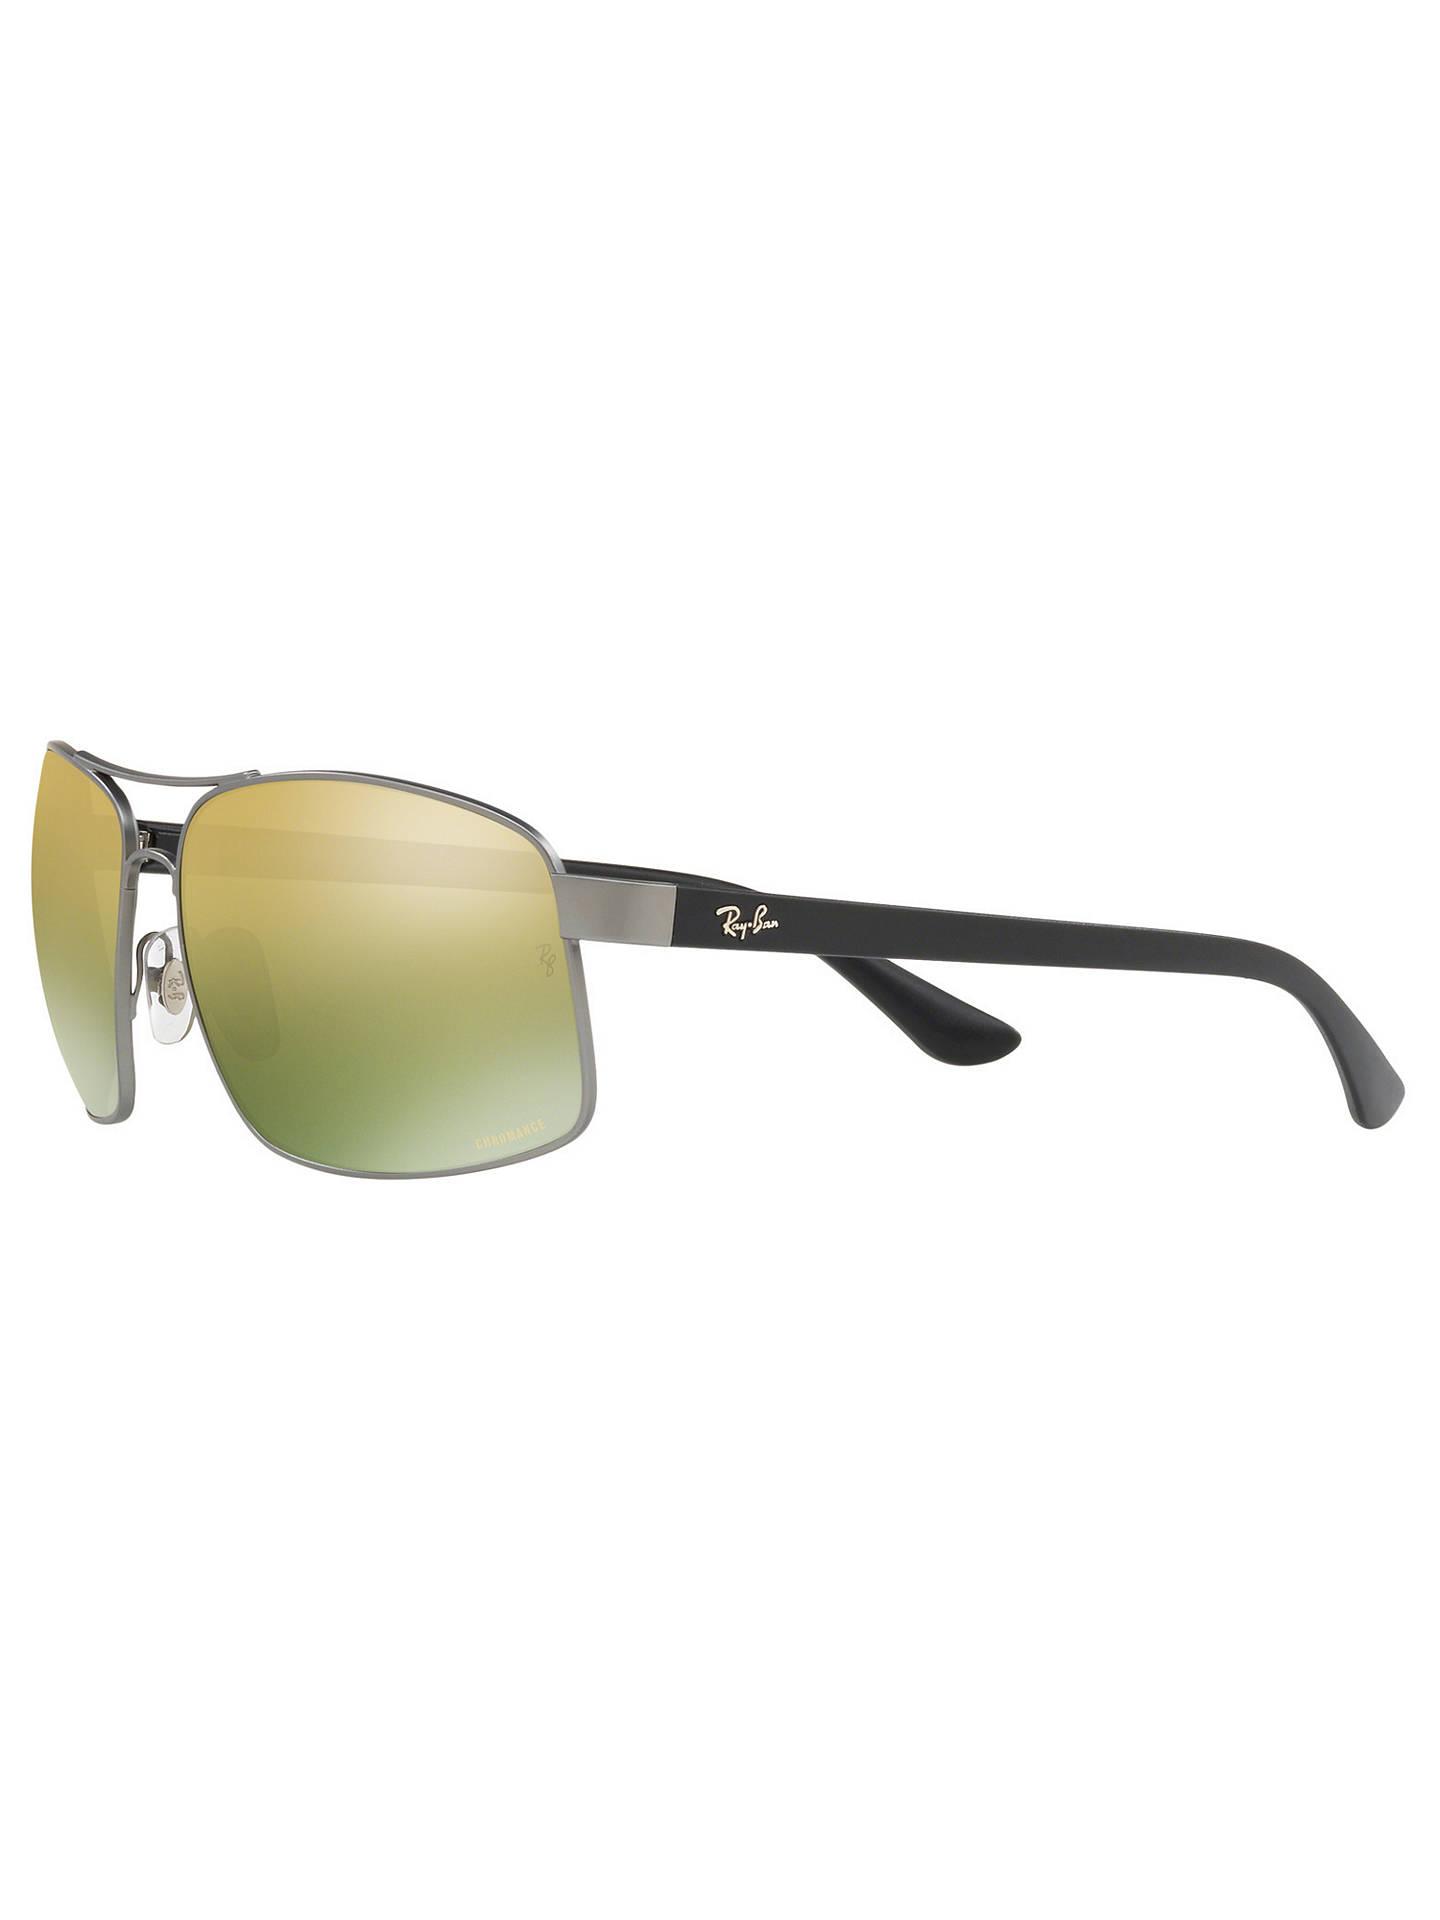 0611606e5cd33e rayban rb3604 men s square sunglasses gold differently a9b15 1c7f7 ...